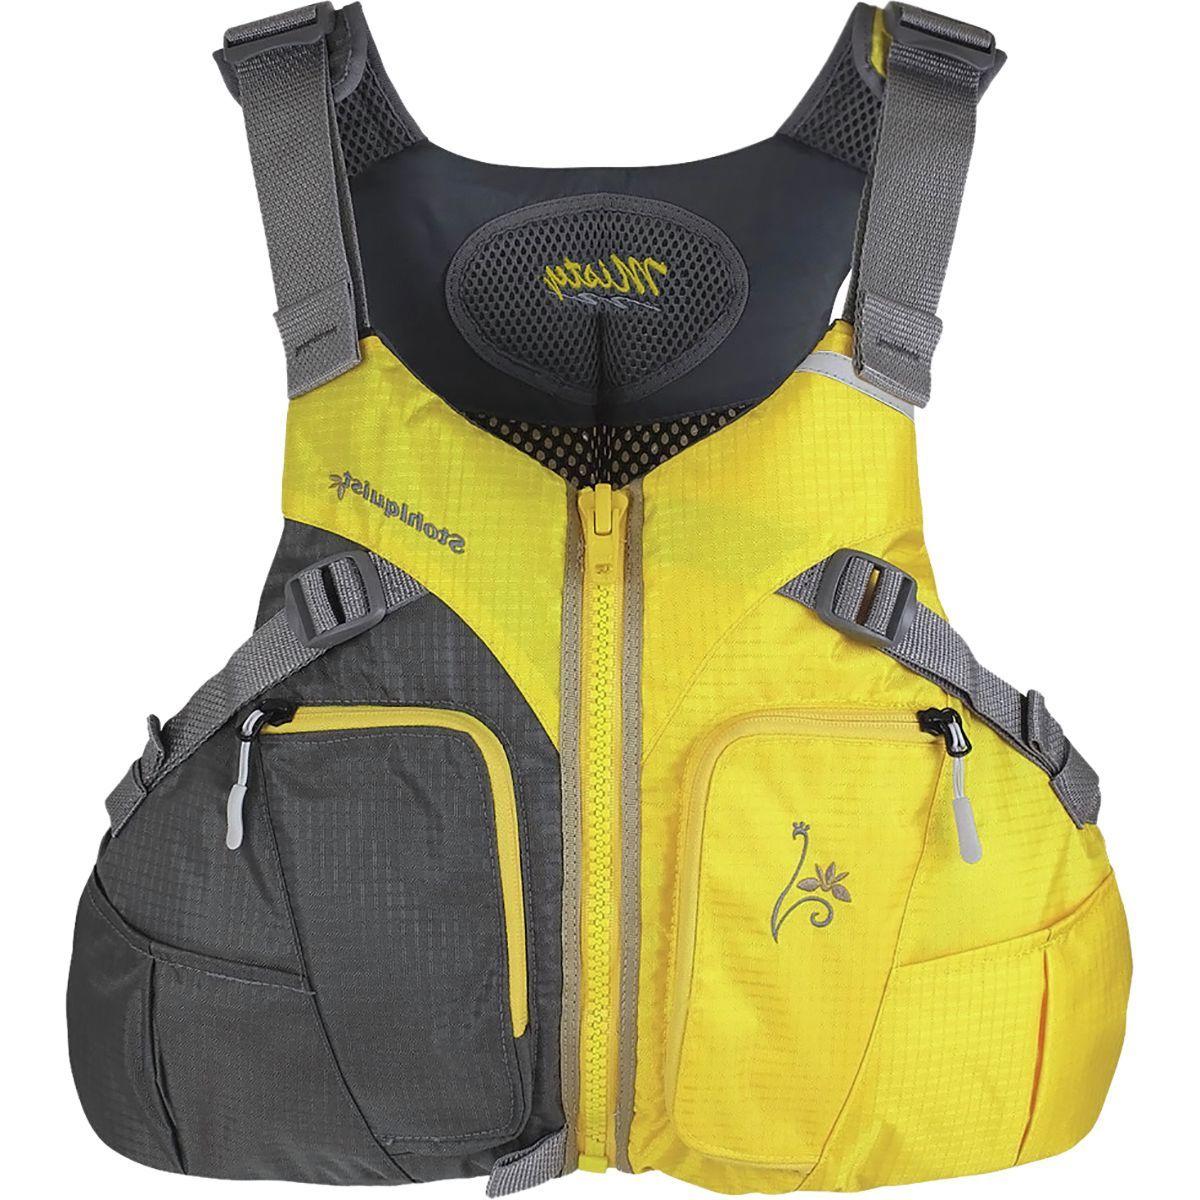 Stohlquist Misty Personal Flotation Device - Women's